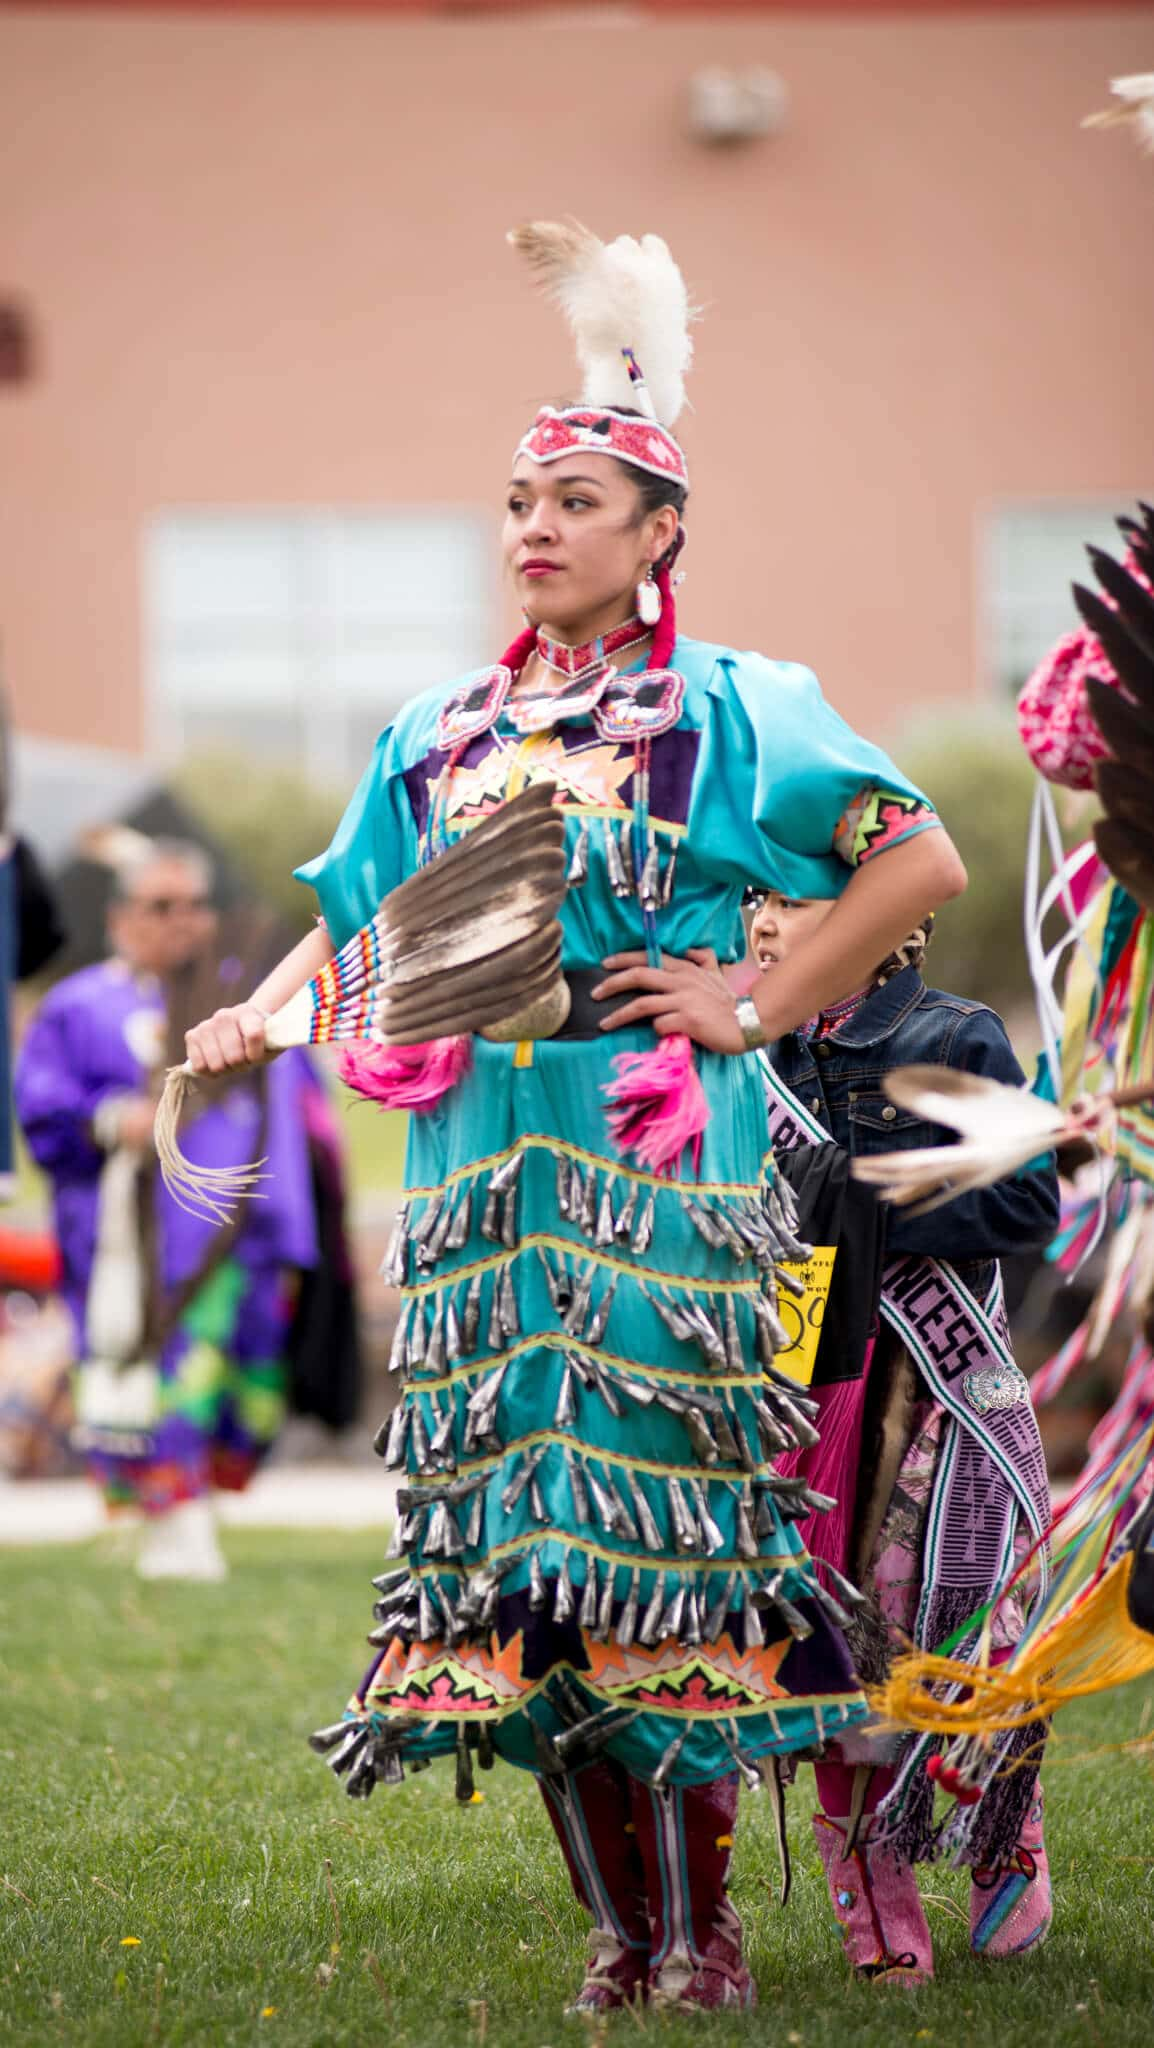 iaia 2016 spring powwow  u0026gt  institute of american indian